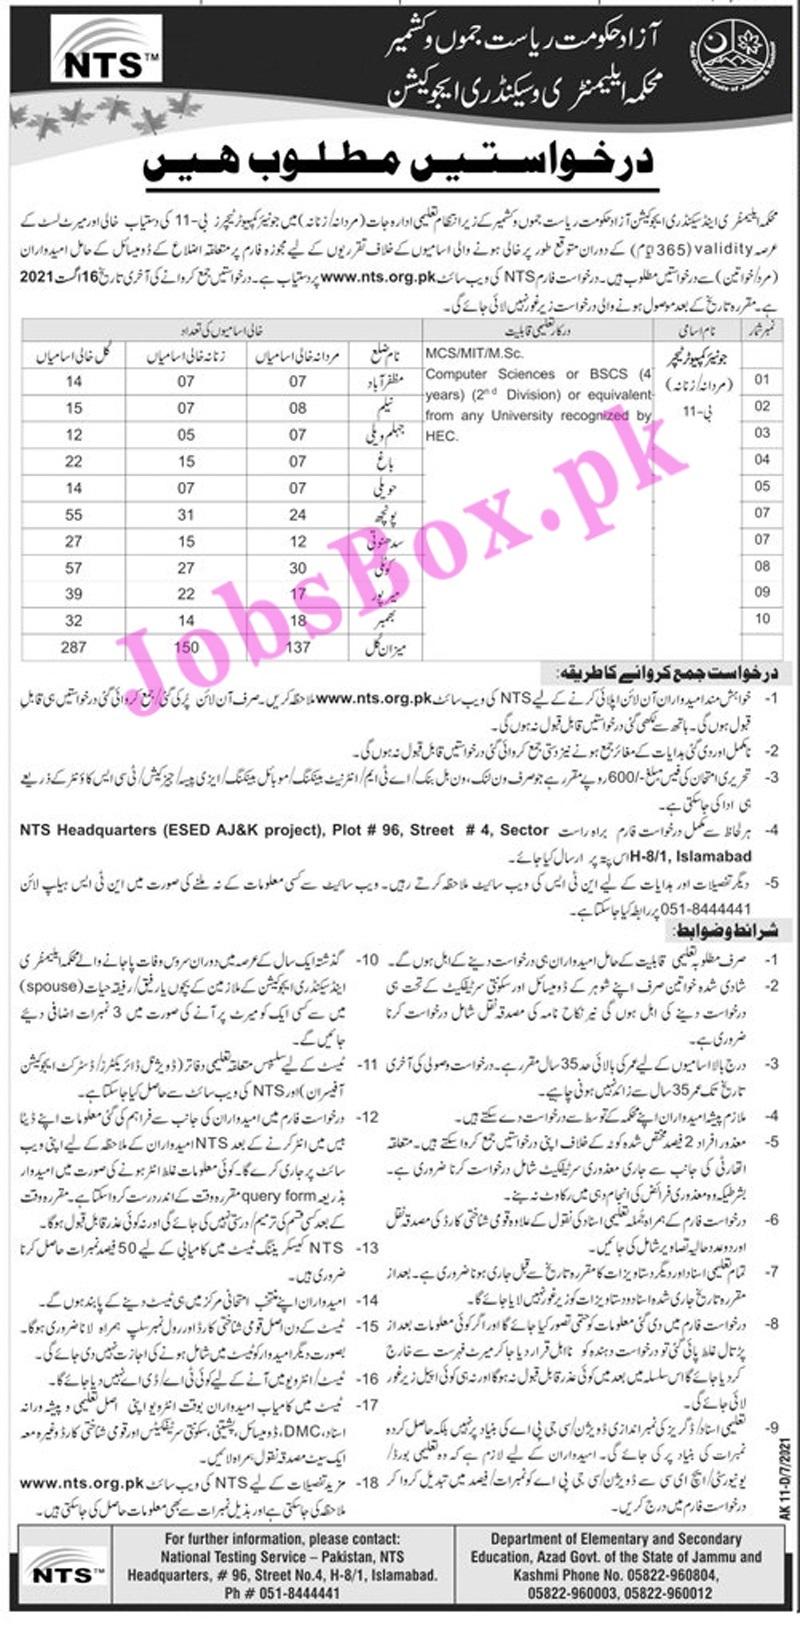 www.nts.org.pk Jobs 2021 - Elementary & Secondary Education Department AJK Jobs 2021 in Pakistan